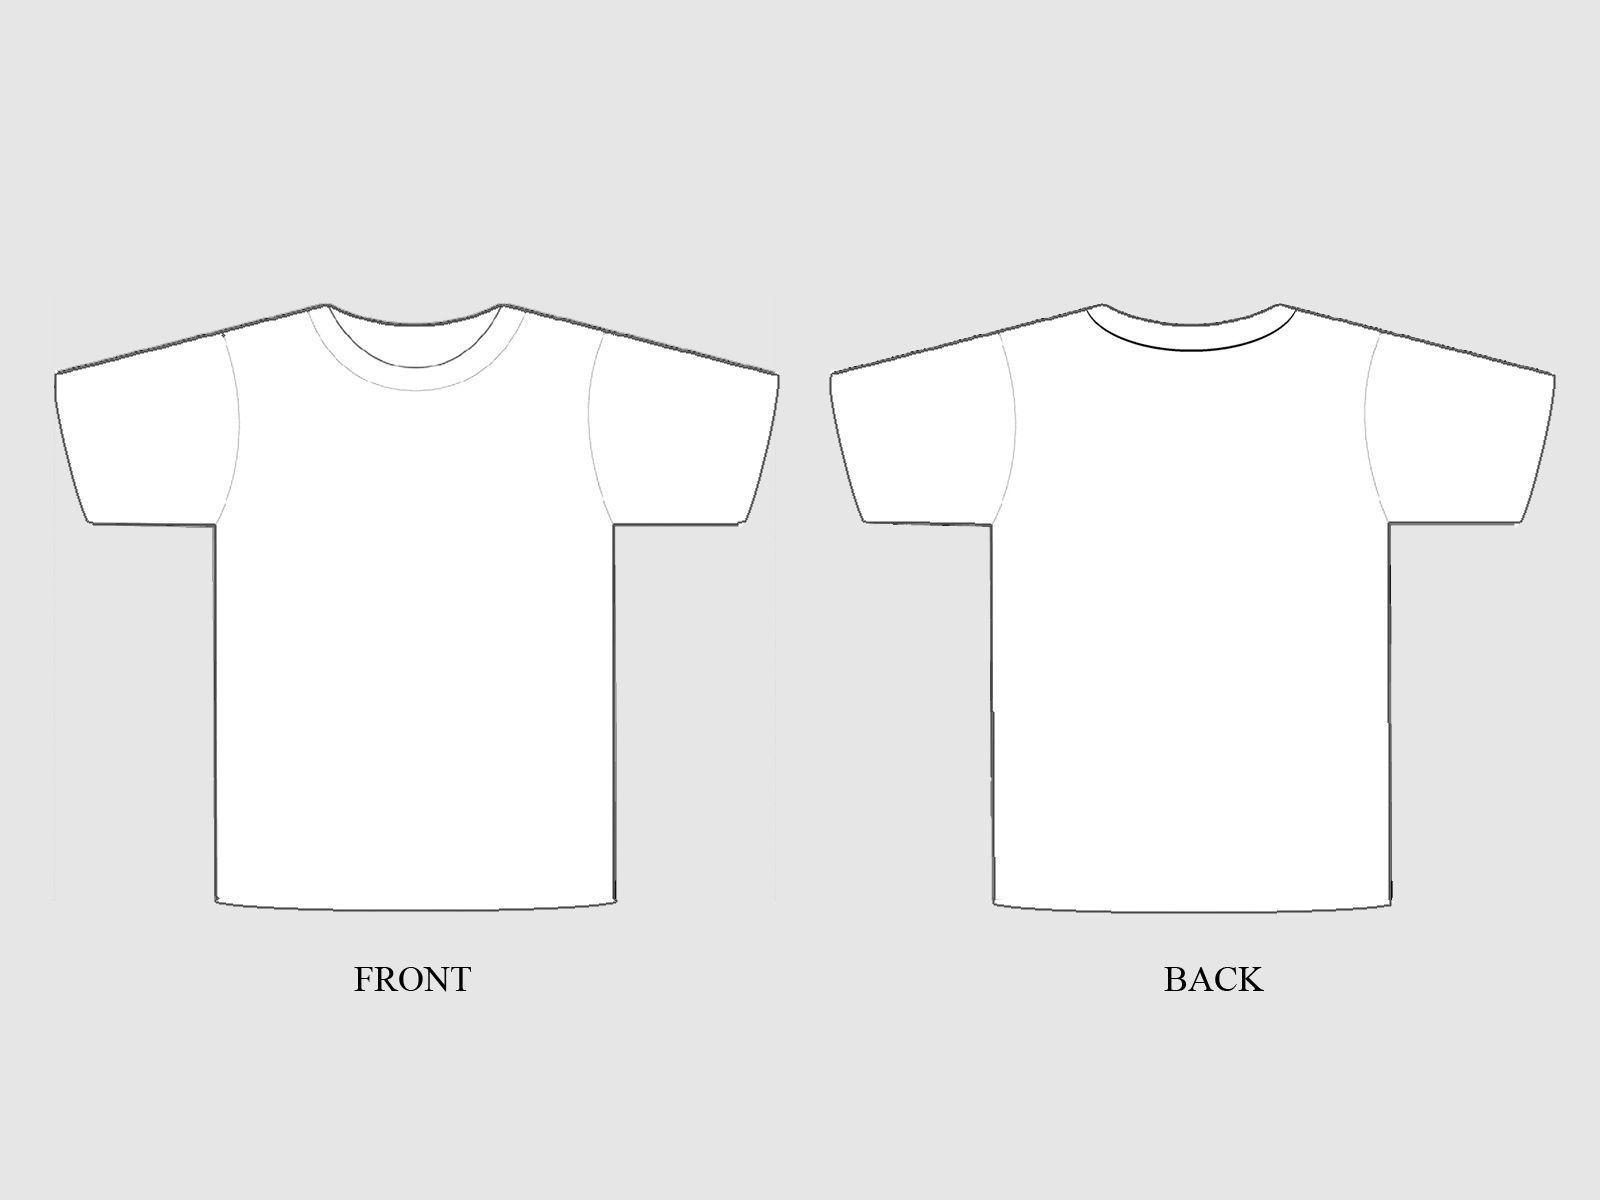 001 Amazing T Shirt Design Template Ai Photo  TeeFull